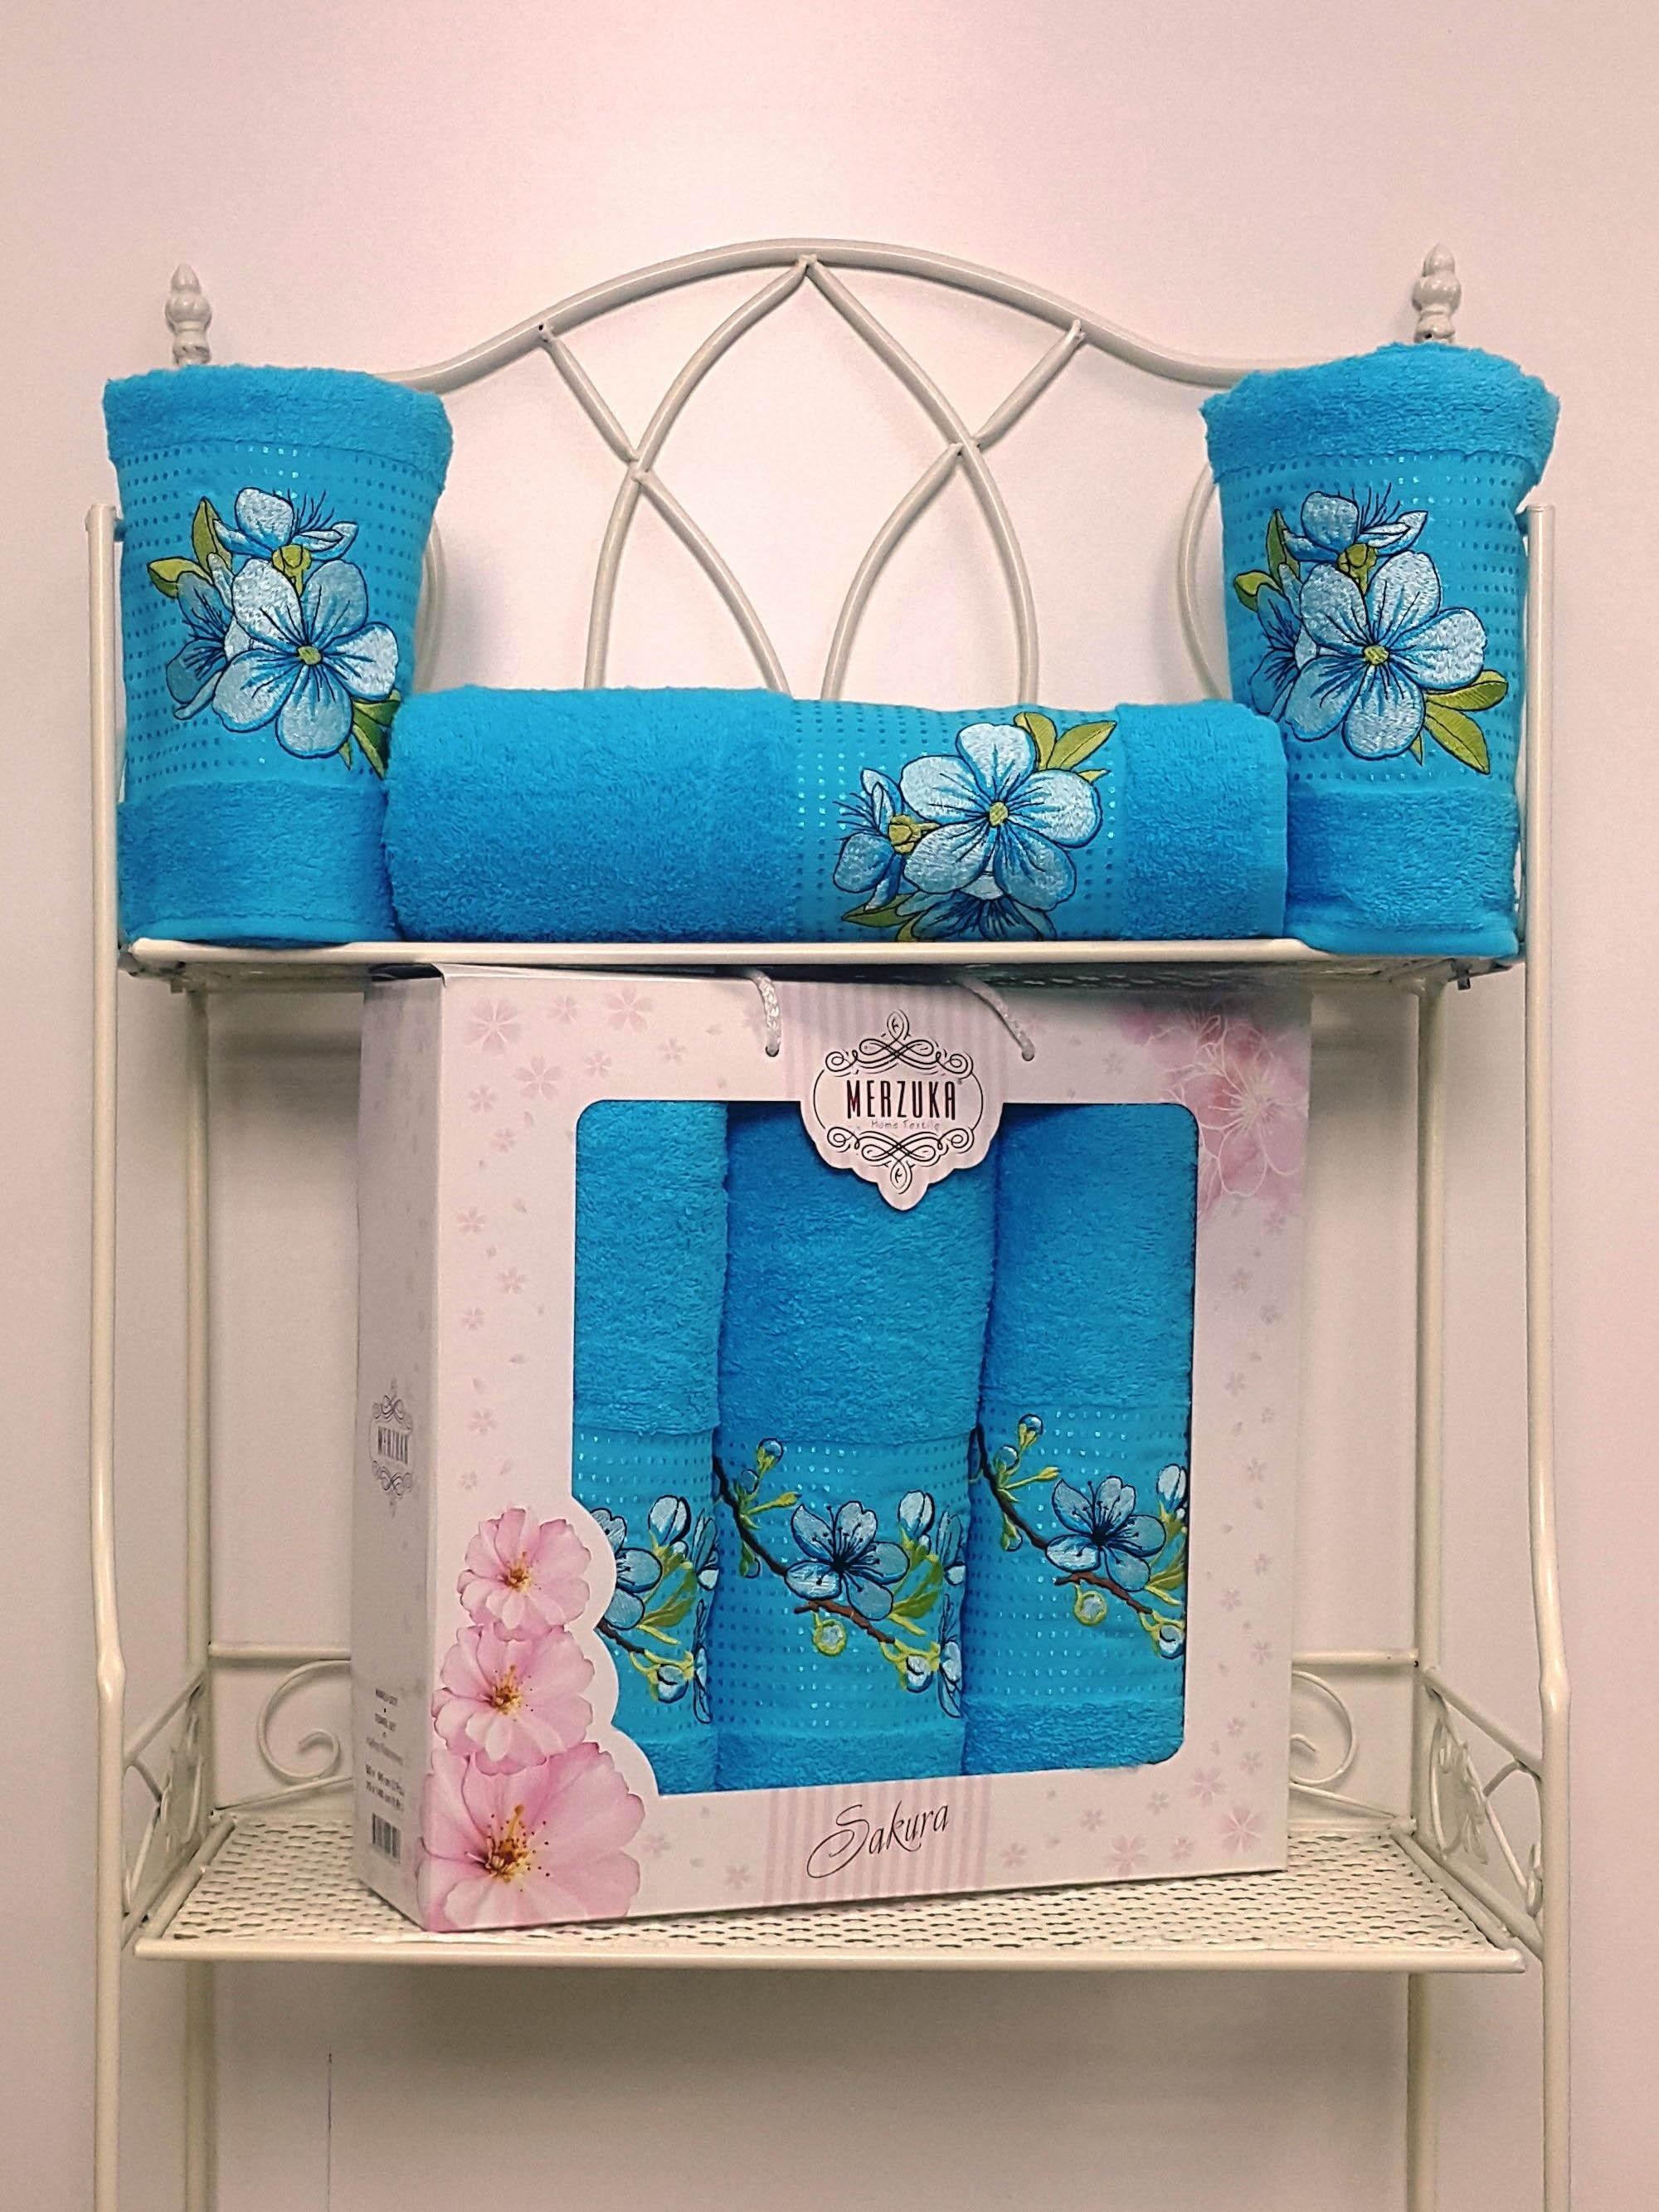 Полотенца Oran Merzuka Полотенце Sakura Цвет: Бирюзовый (Набор) набор из 3 полотенец merzuka sakura 50х90 2 70х140 8432 терракотовый